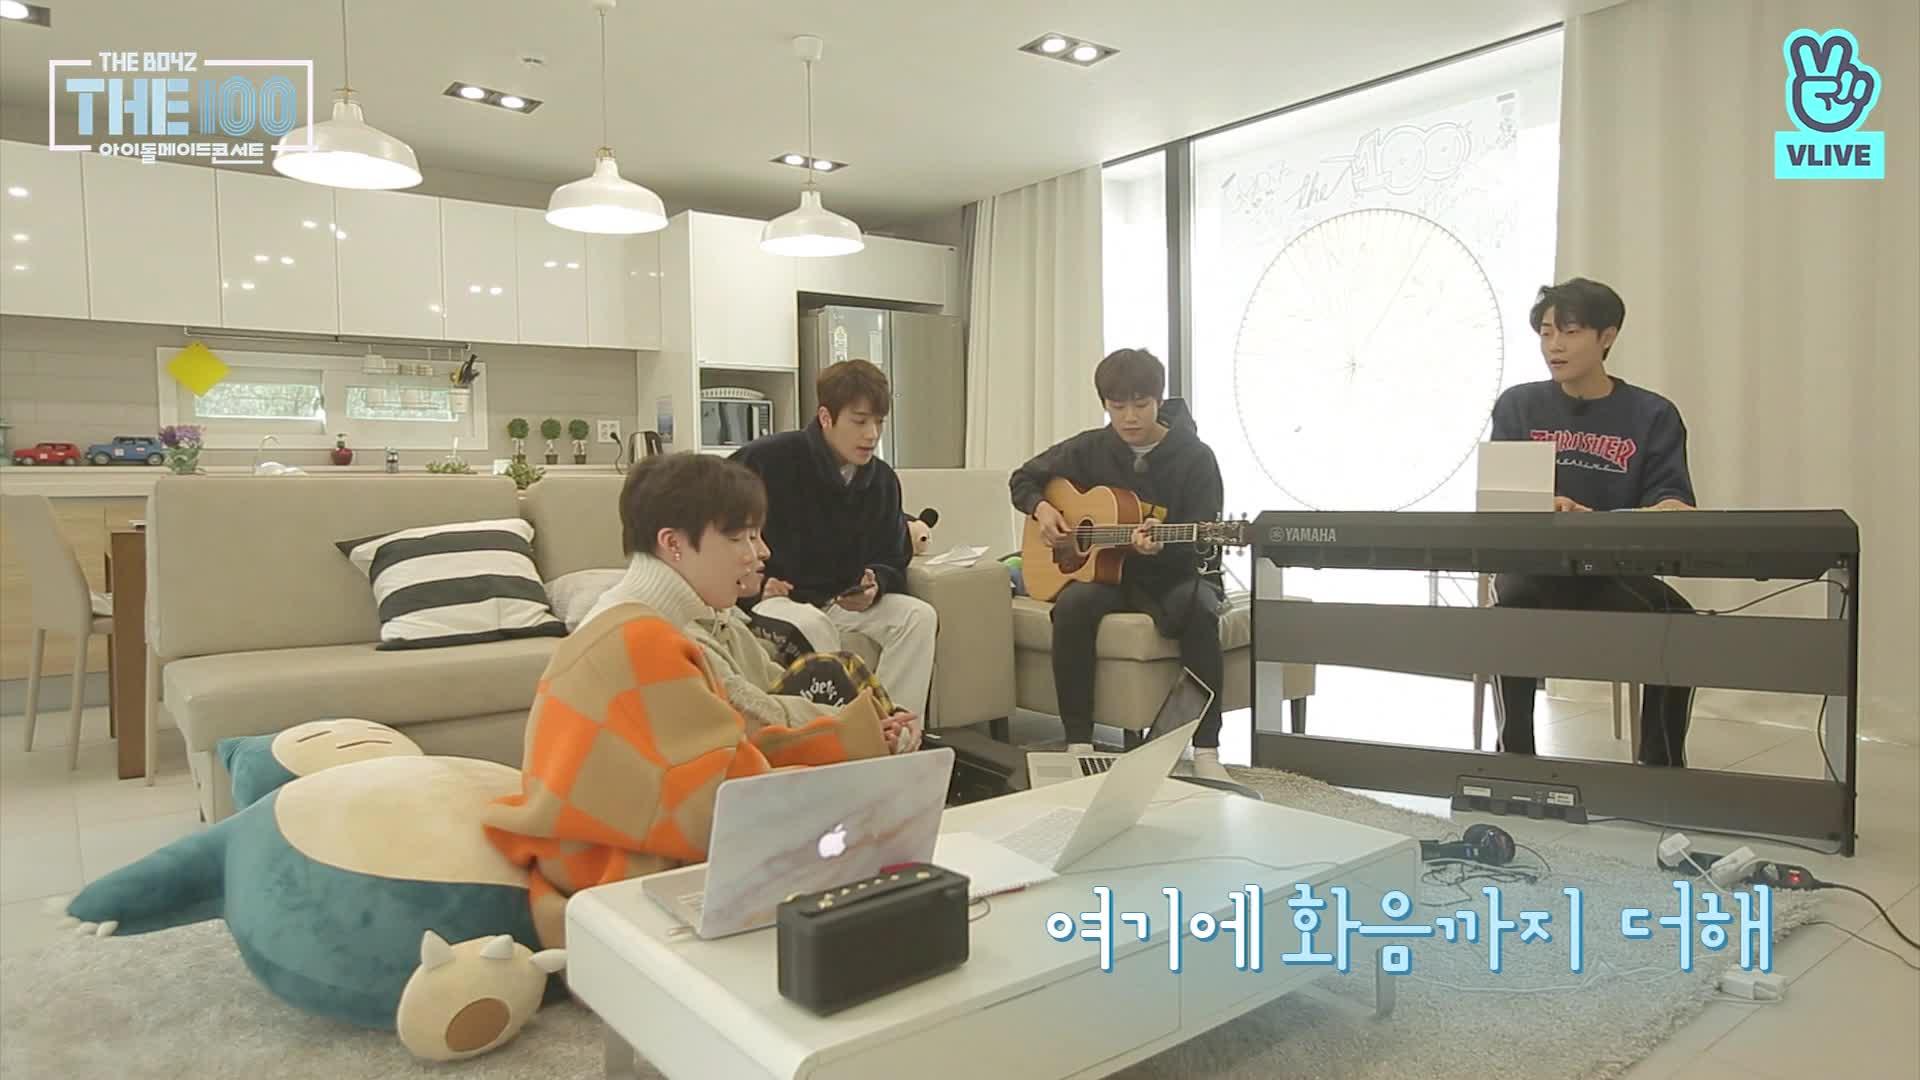 [THE100] 본격적인 유닛연습시작! - EP 08